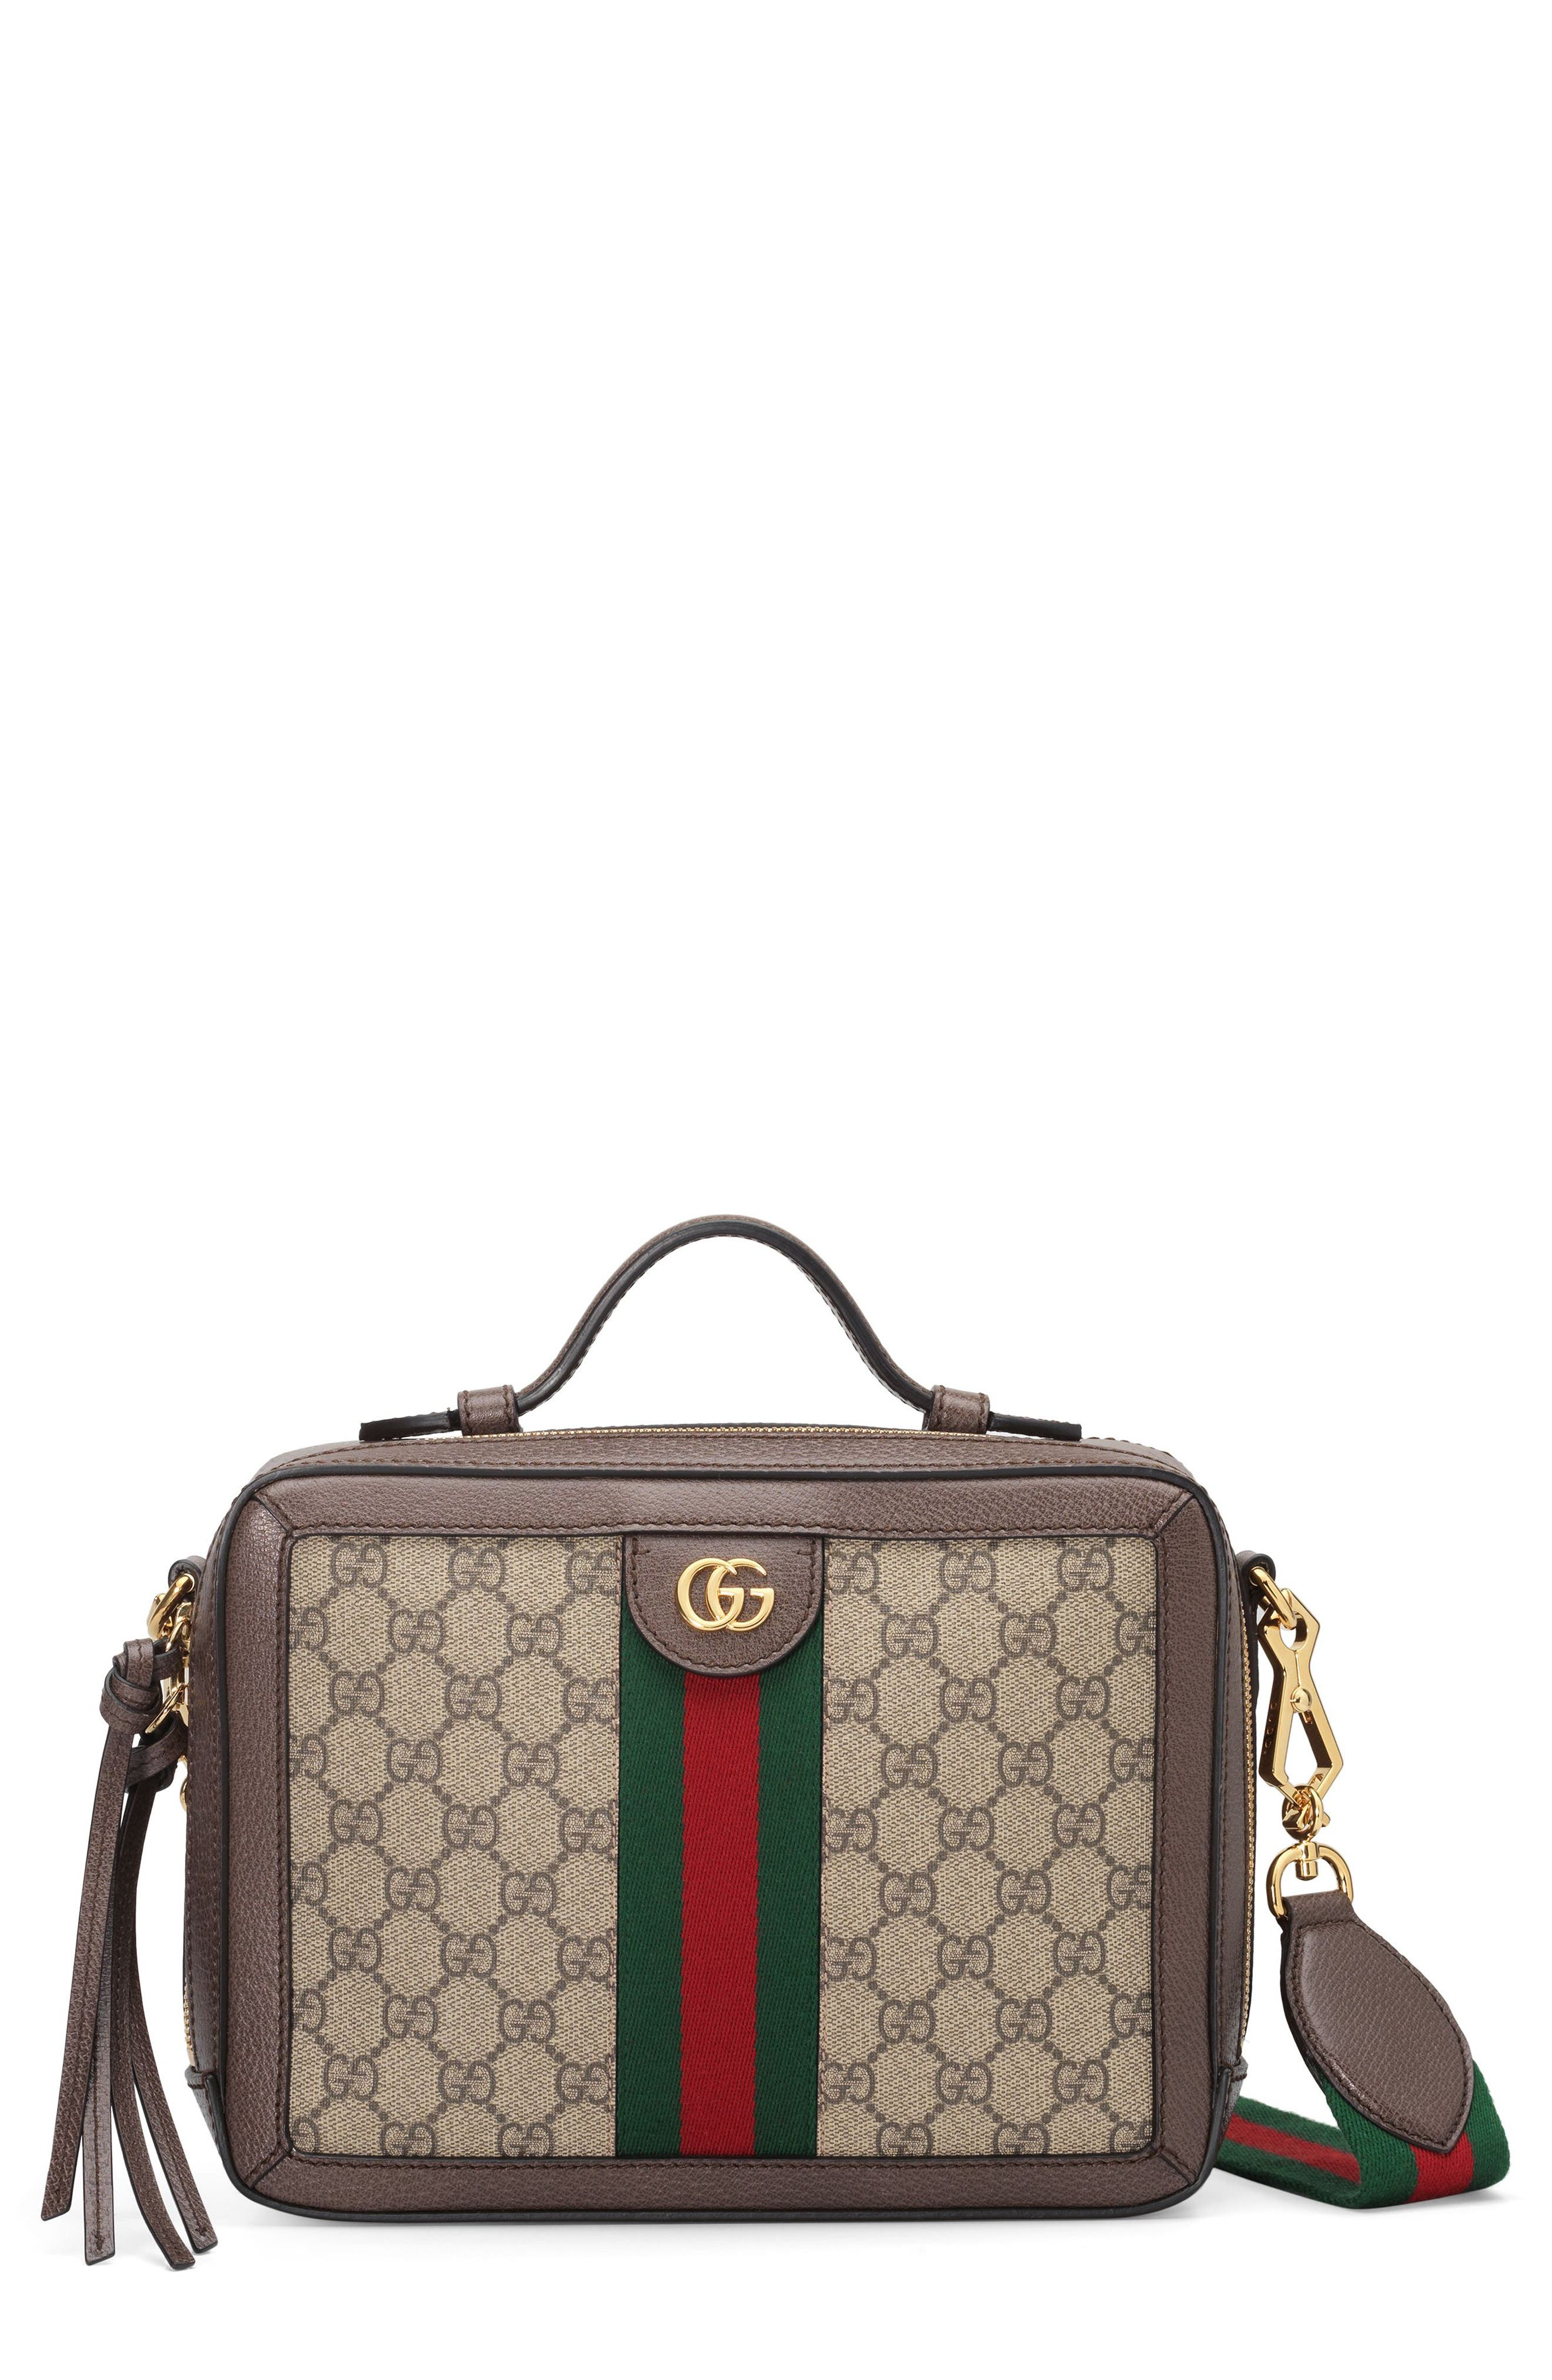 GUCCI, Small Ophidia GG Supreme Canvas Shoulder Bag, Main thumbnail 1, color, 250